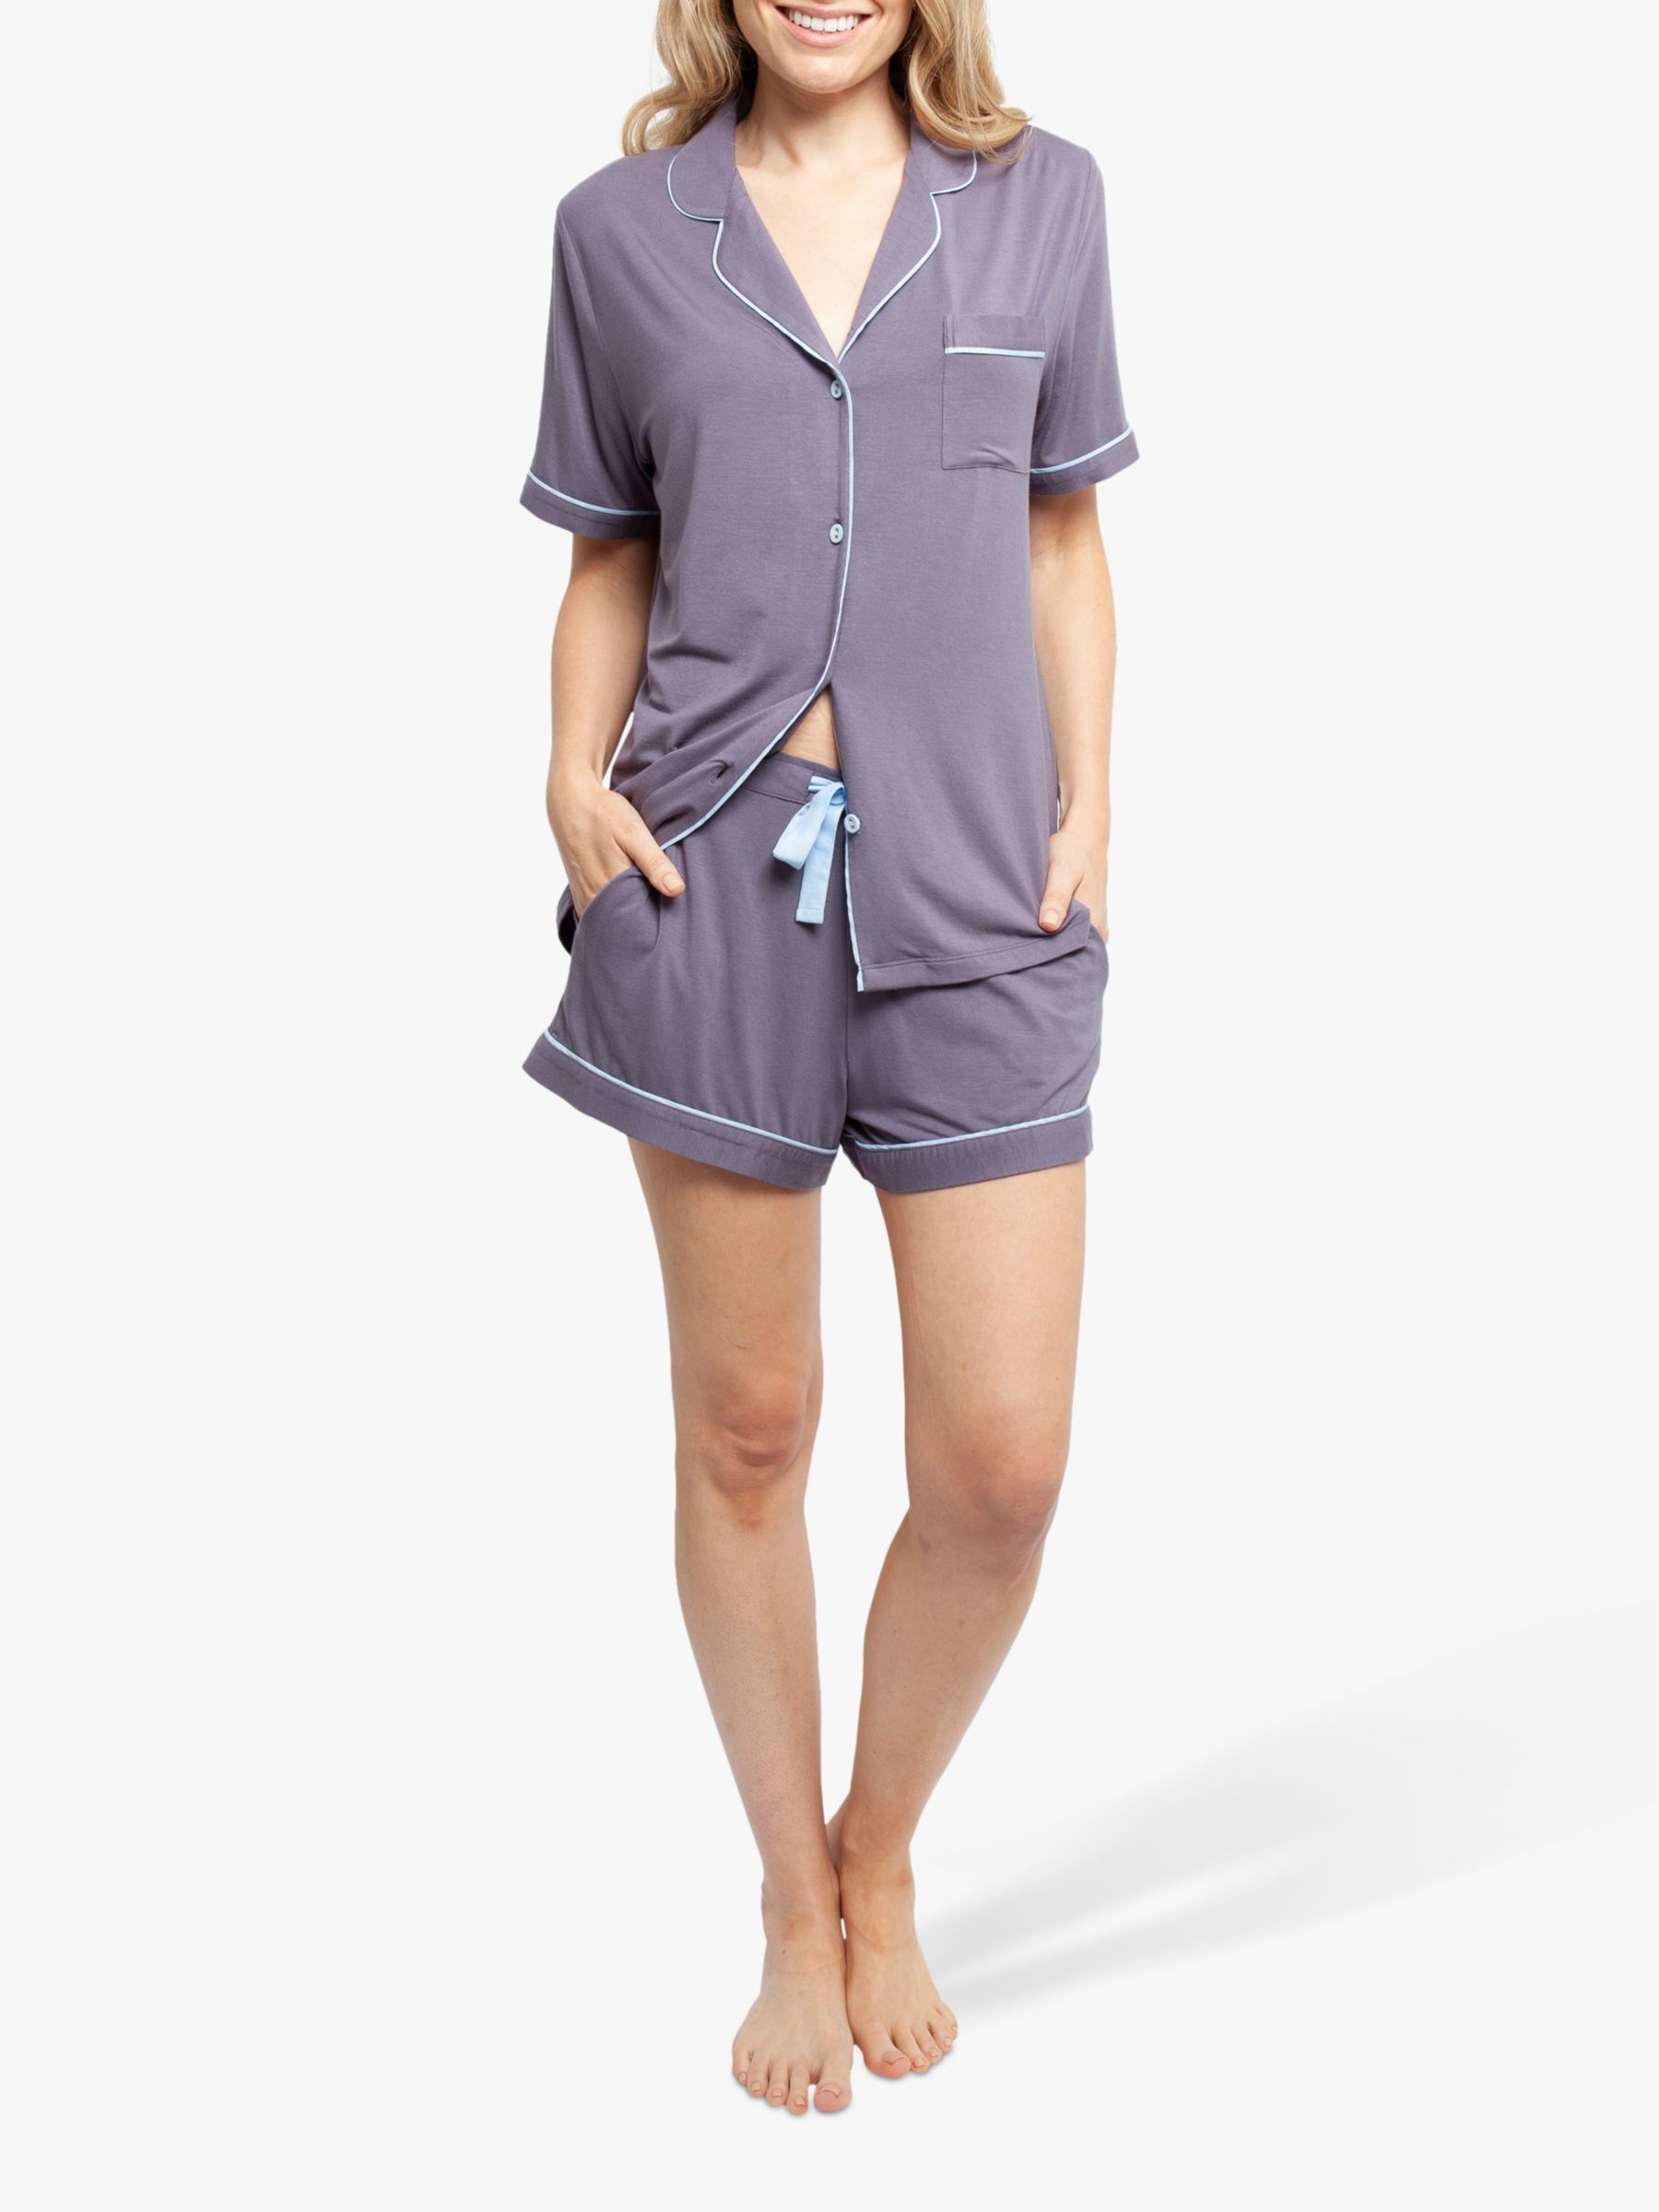 Cyberjammies Cyberjammies Olivia Shorts Pyjama Set, Grey